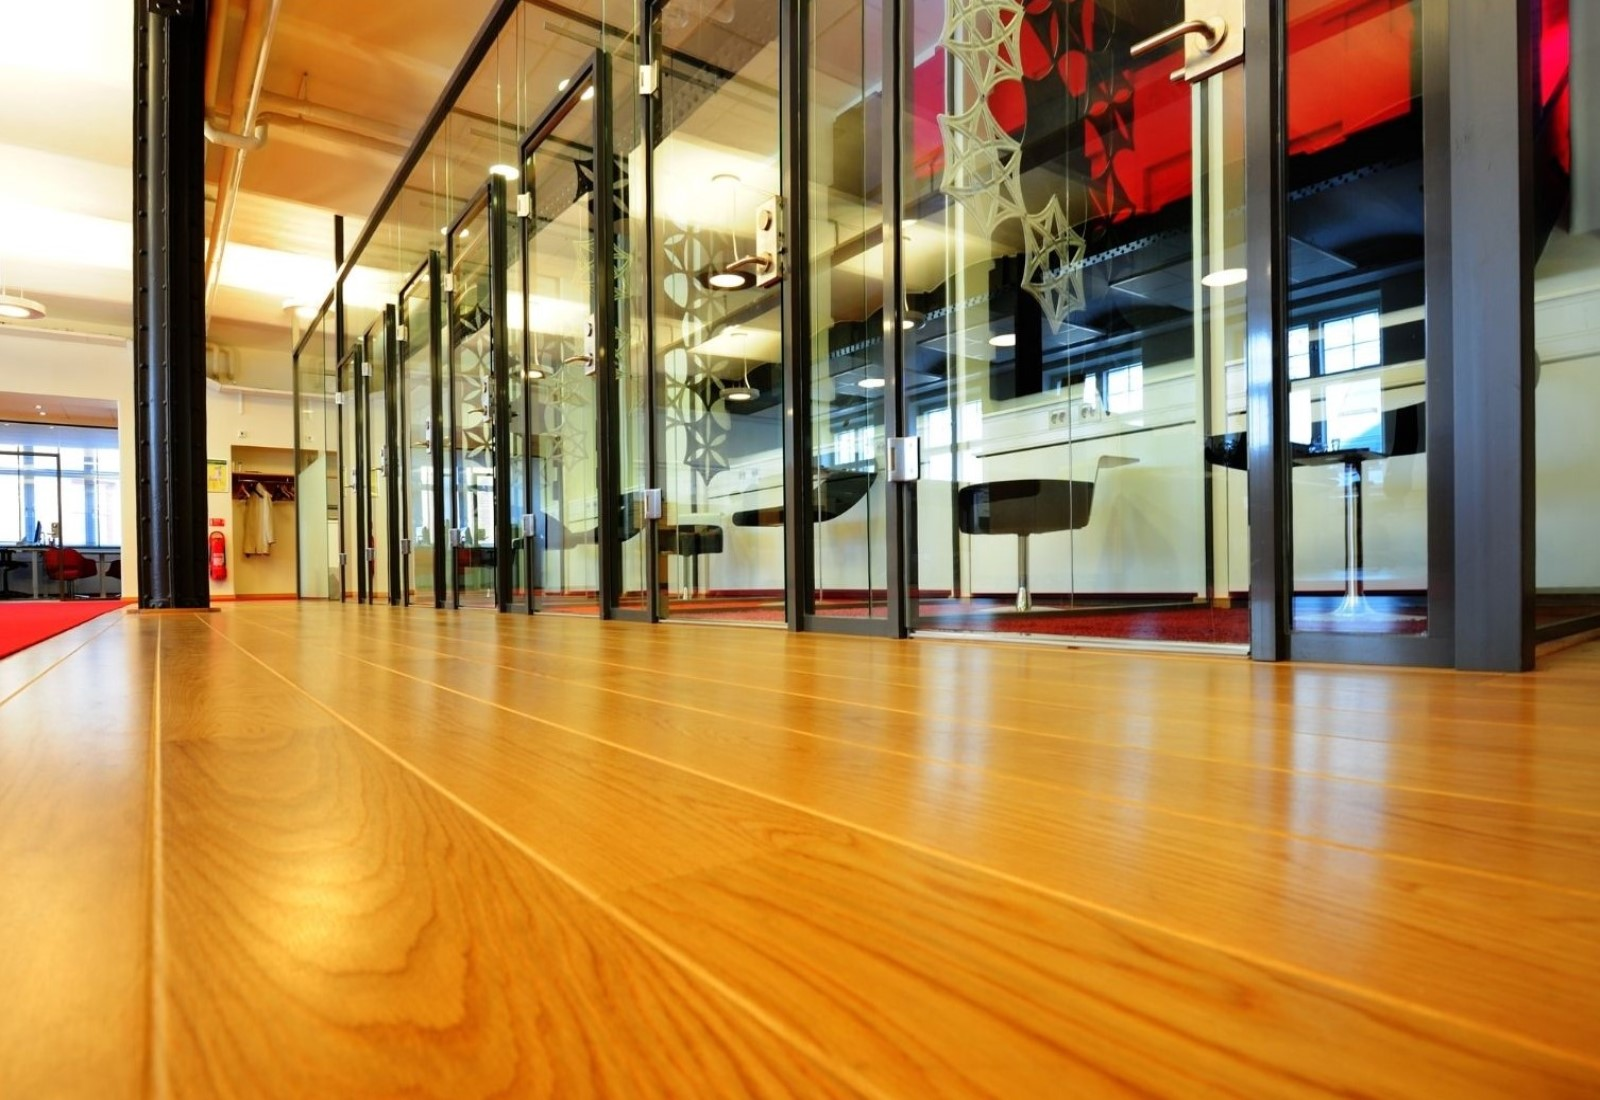 Commercial floor wooden polishing sanding polished timber hardwood